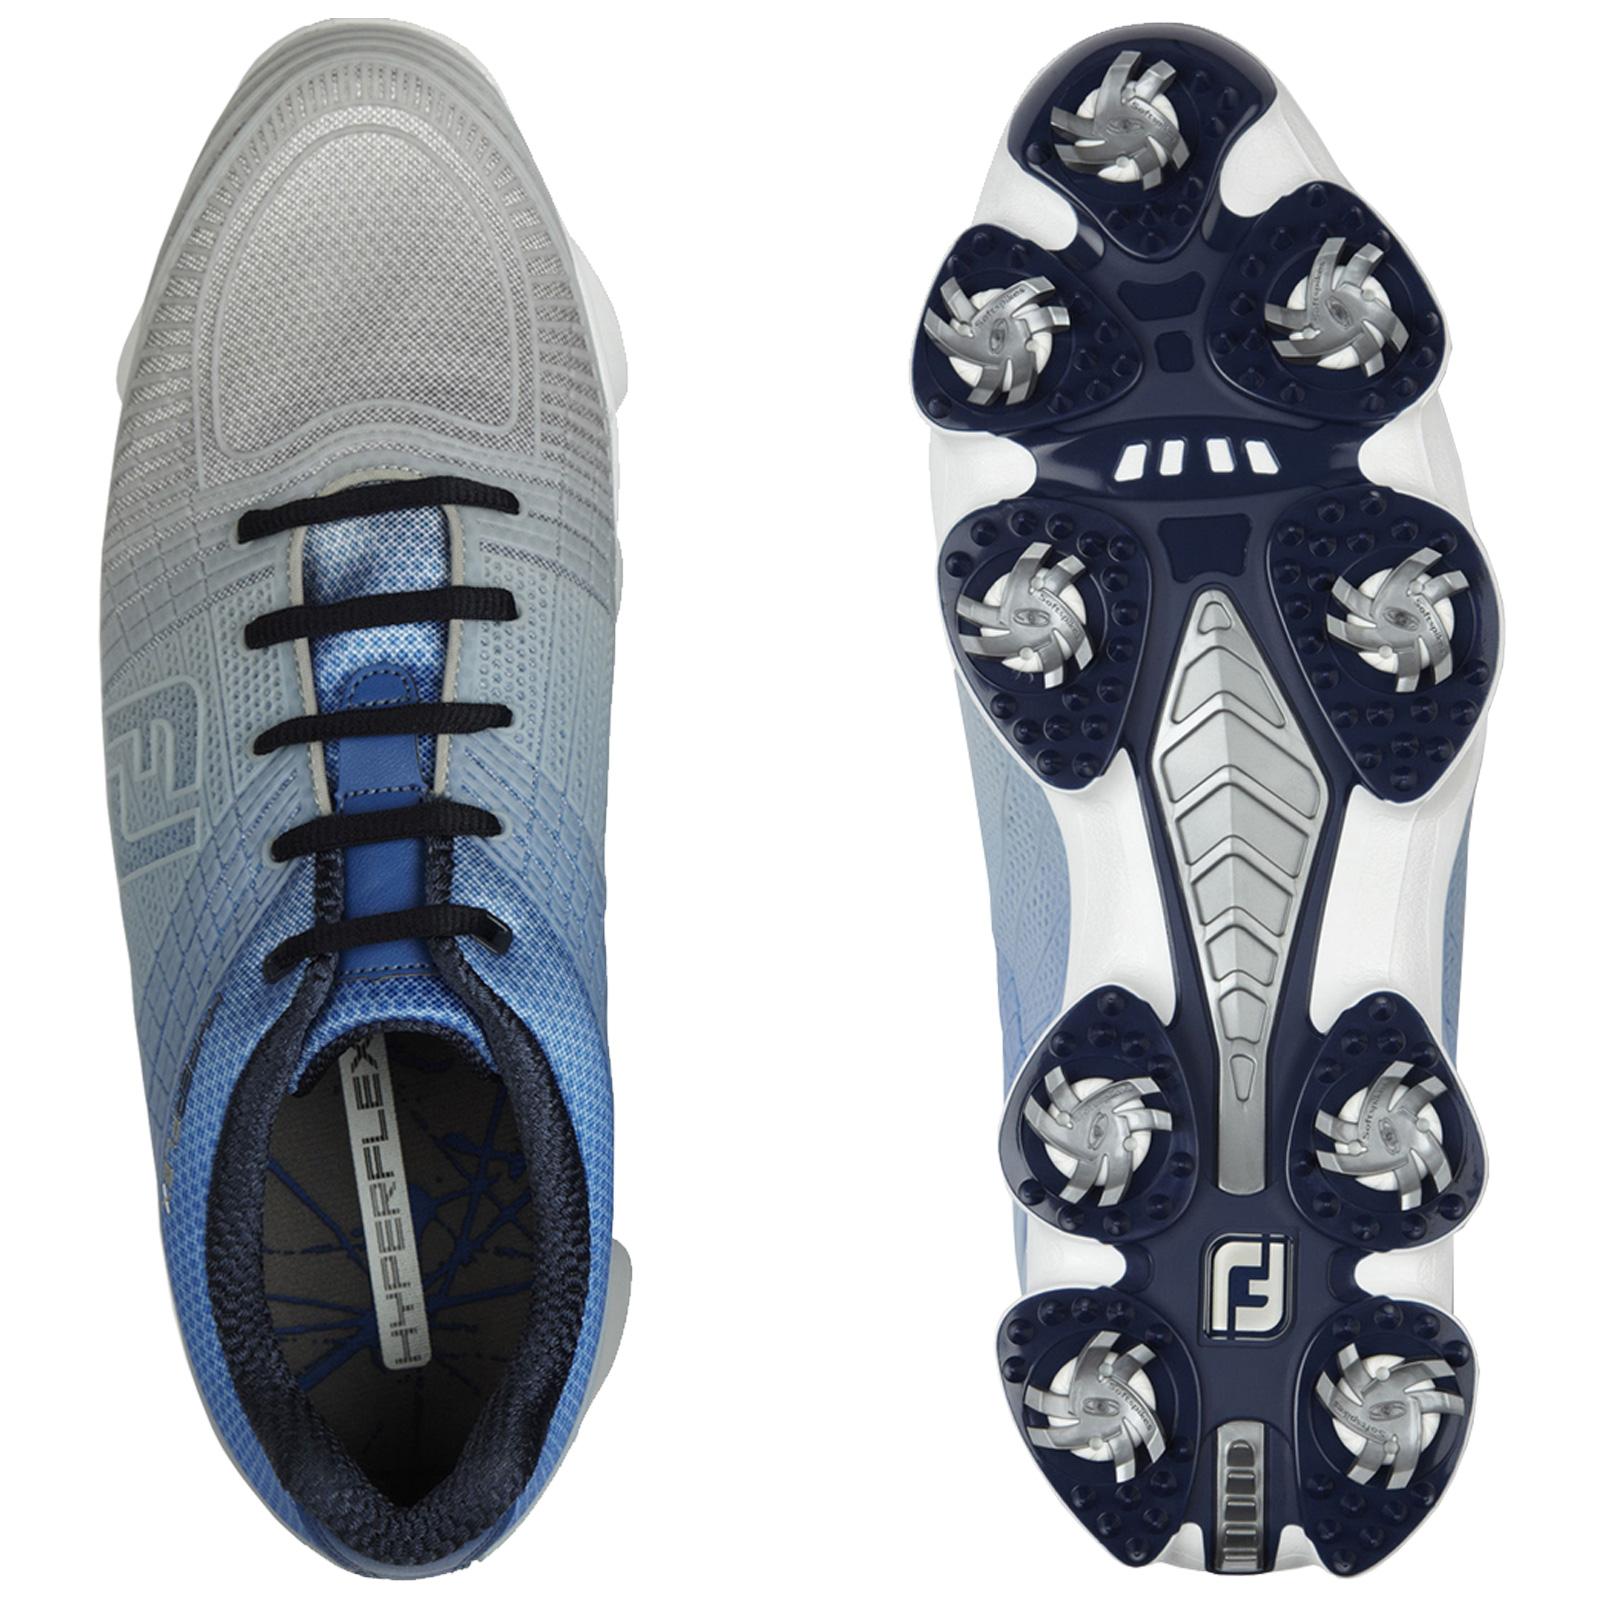 Details about FootJoy Mens Hyperflex II 2.0 Waterproof Golf Shoes Spiked FJ Modern Trainers